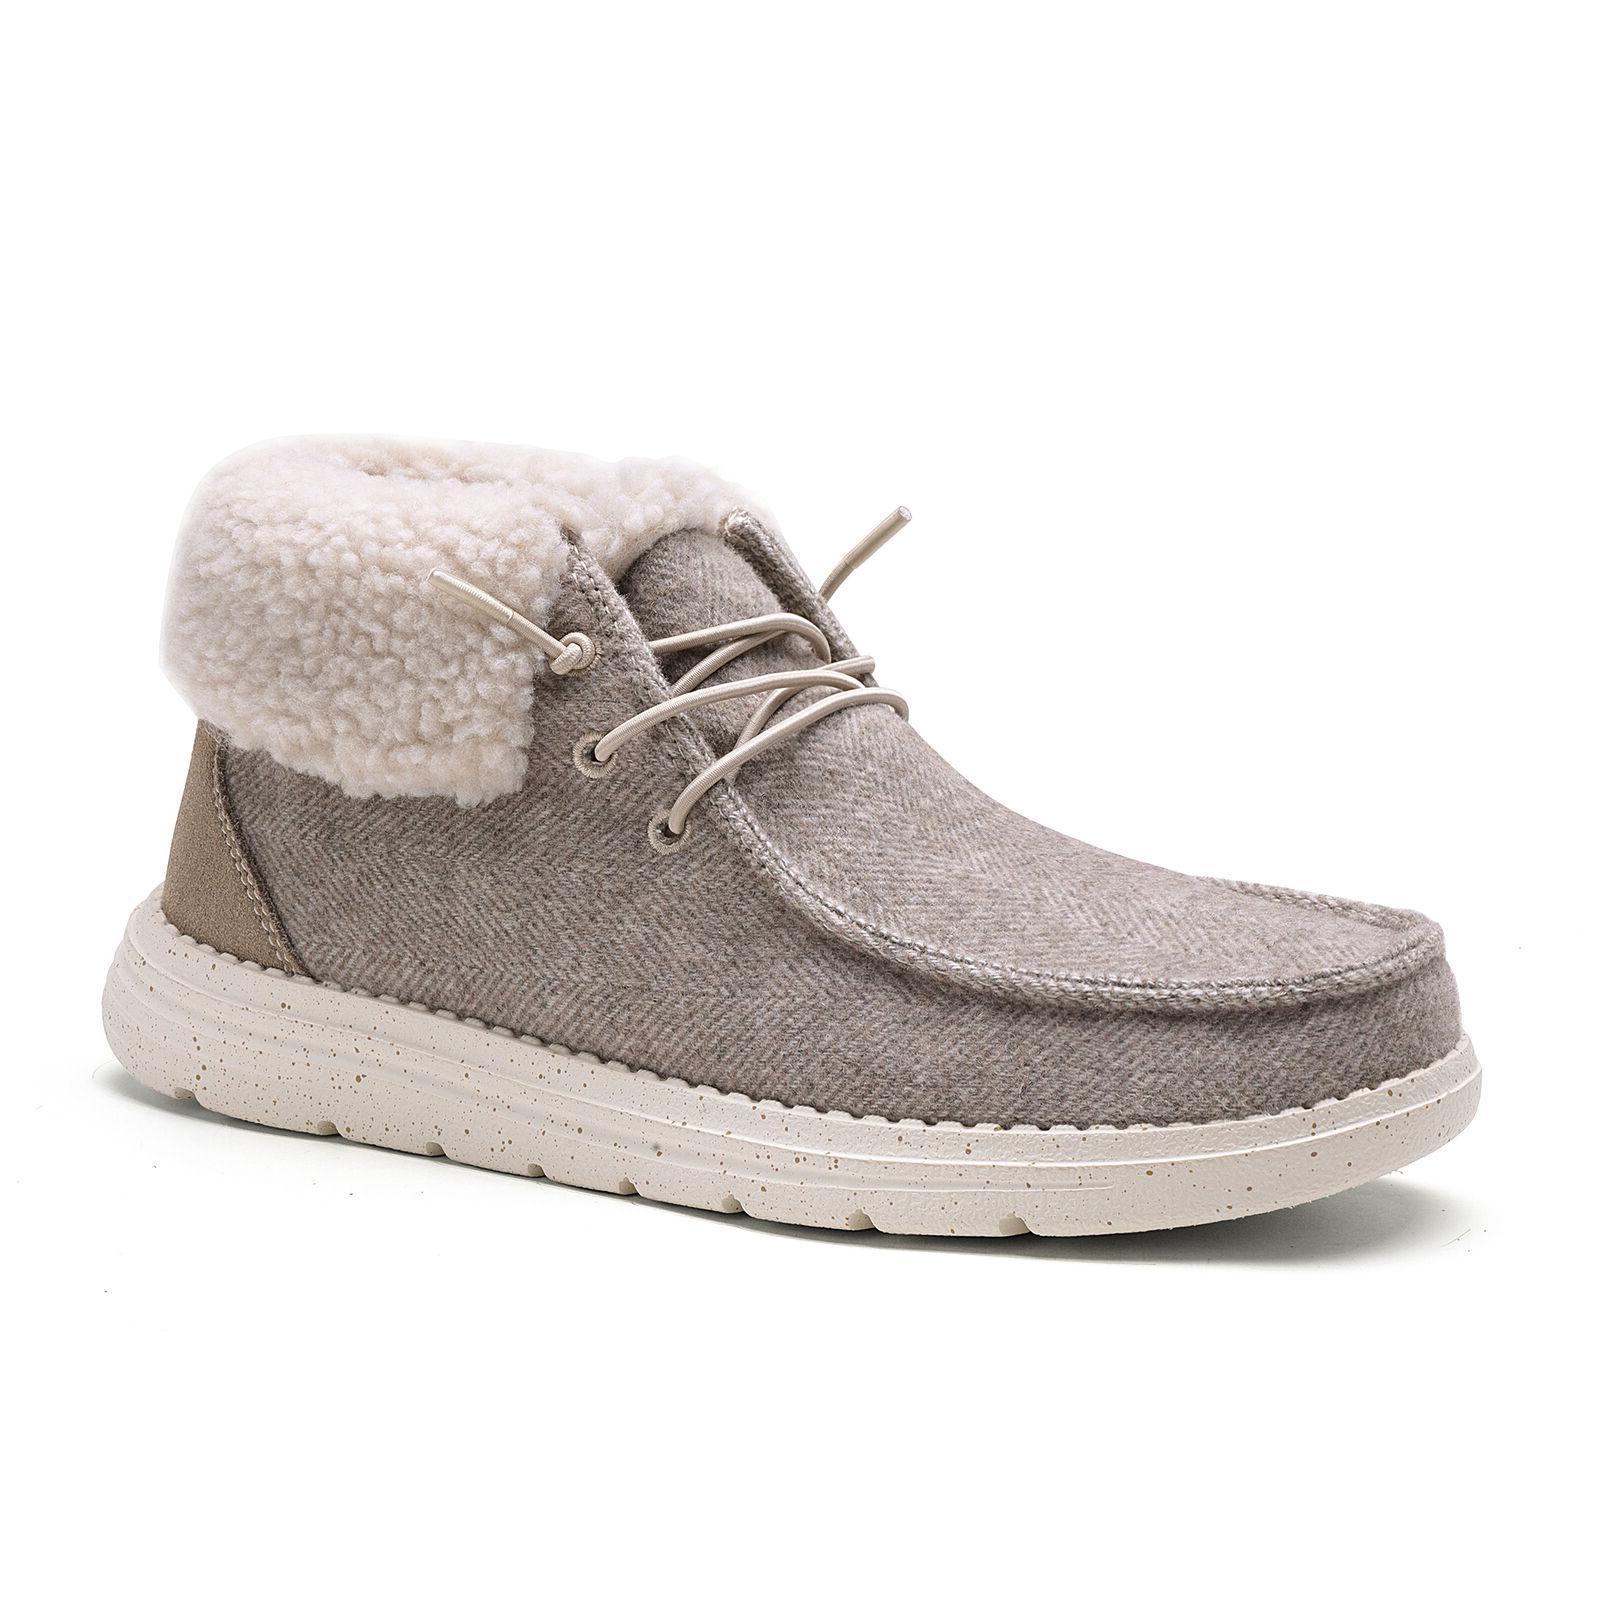 marc men s genuine leather square toe